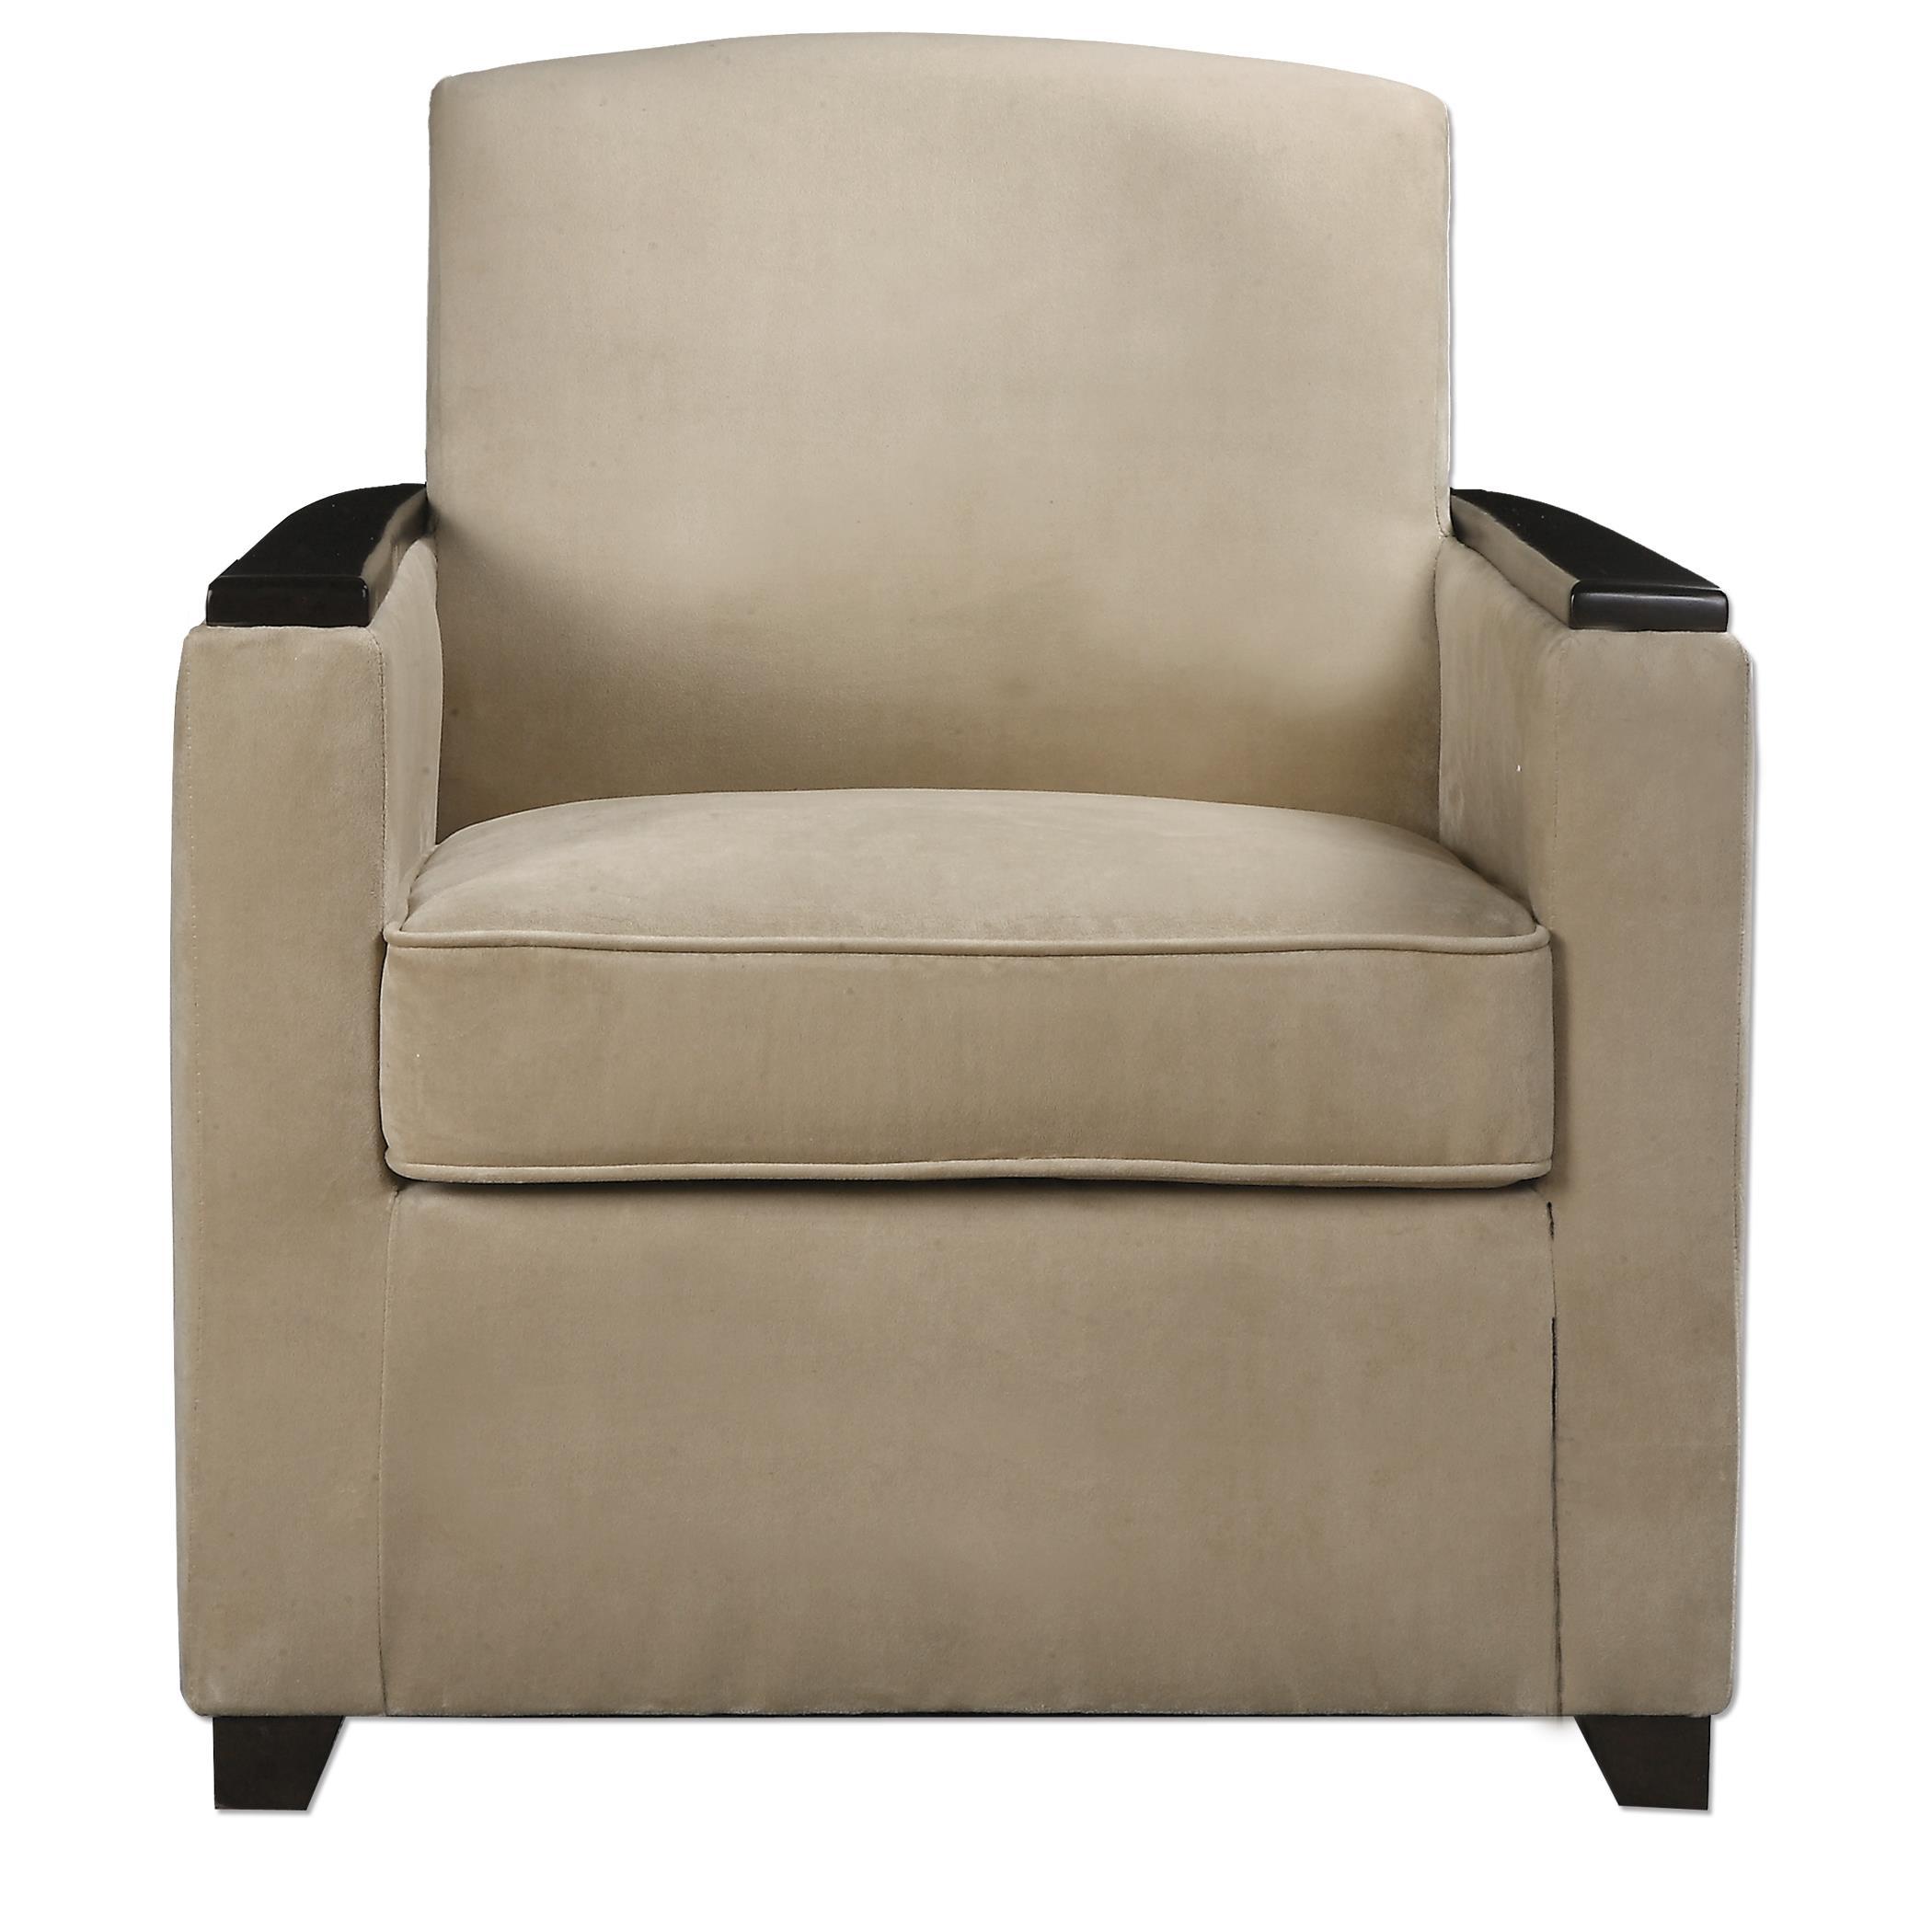 Uttermost Accent Furniture Kempton Modern Armchair - Item Number: 23243